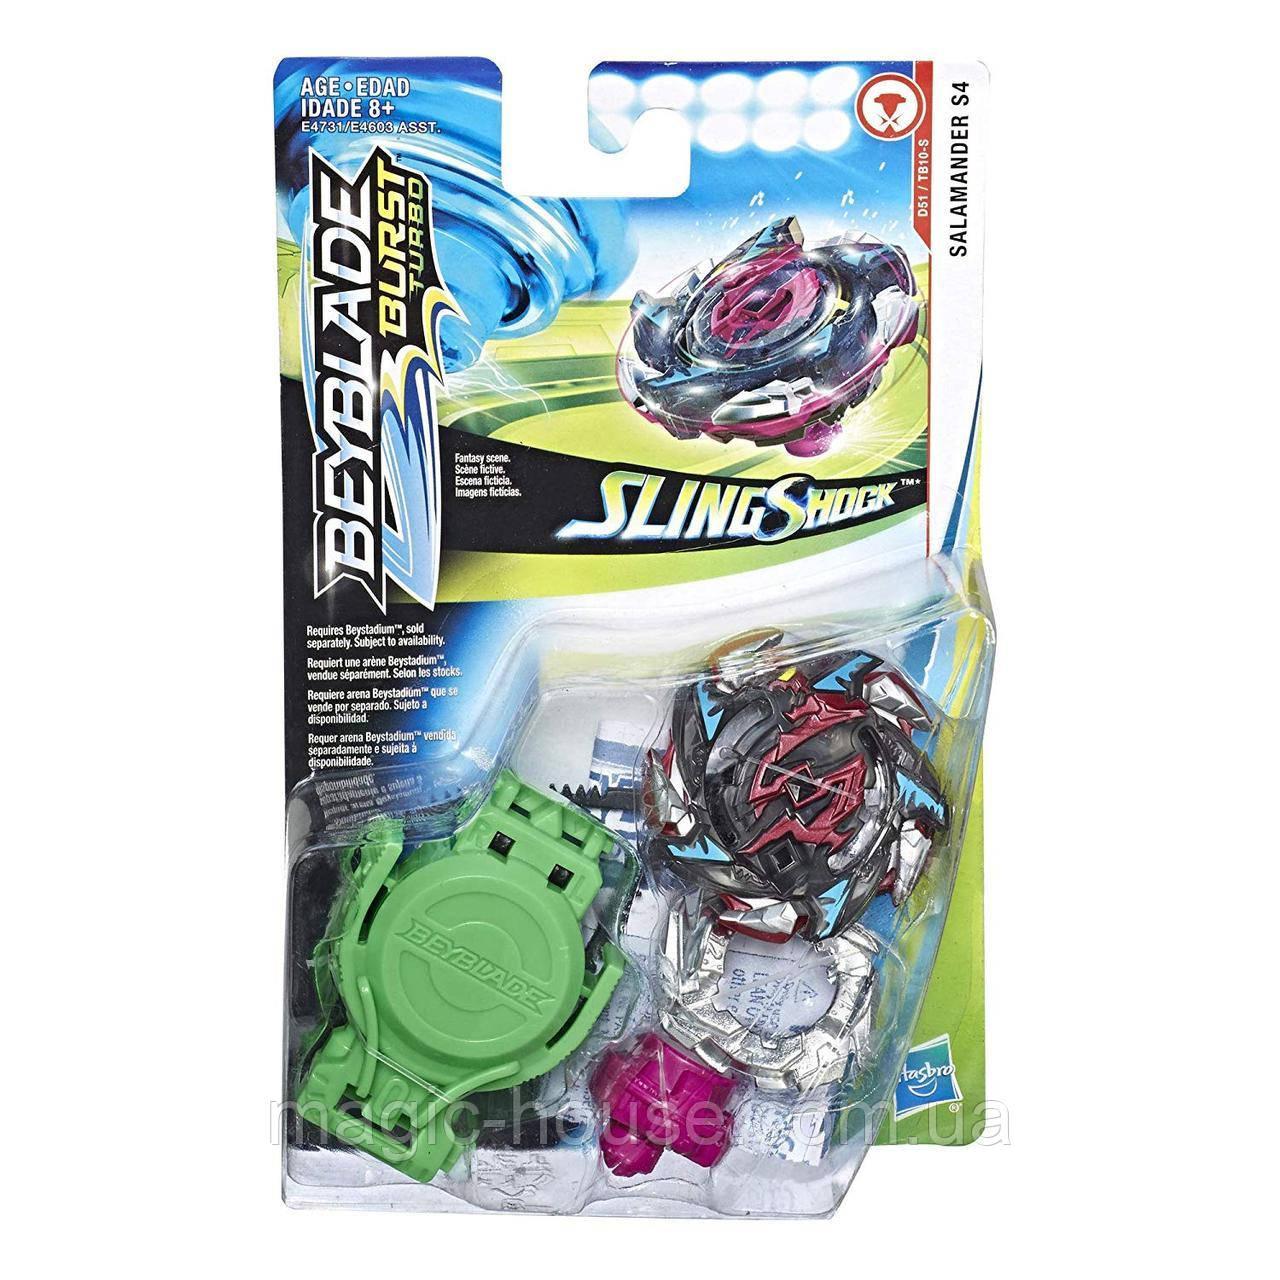 Бейблейд Саламандра Burst Turbo SlingshockSalamander  Starter Pack L4BEYBLADEот Hasbro